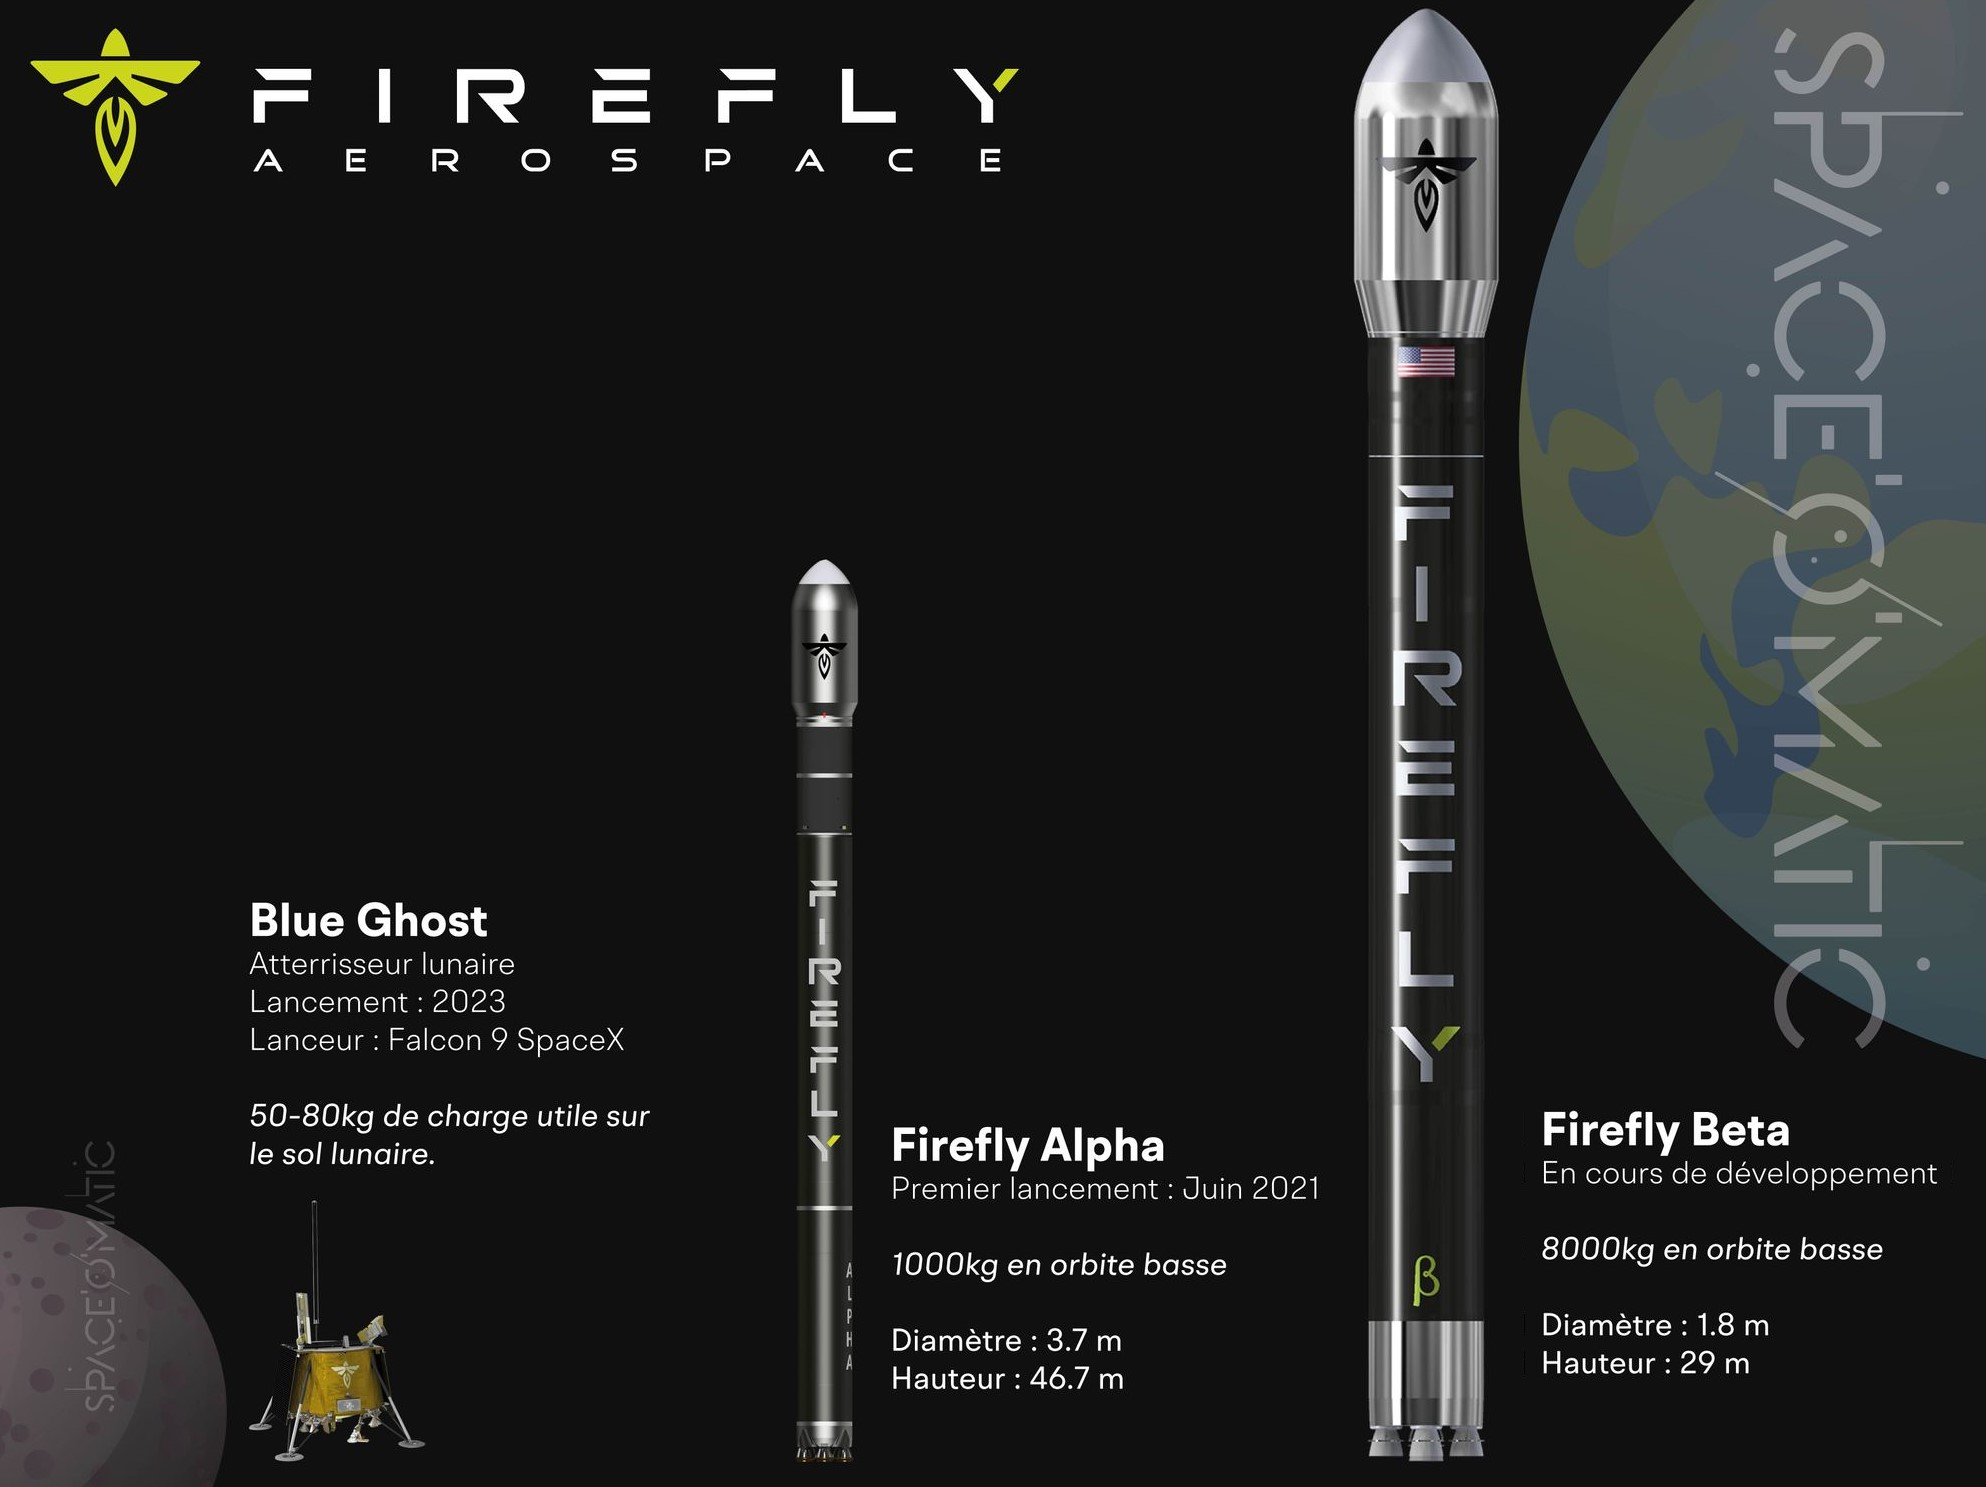 Les projets de Firefly Aerospace